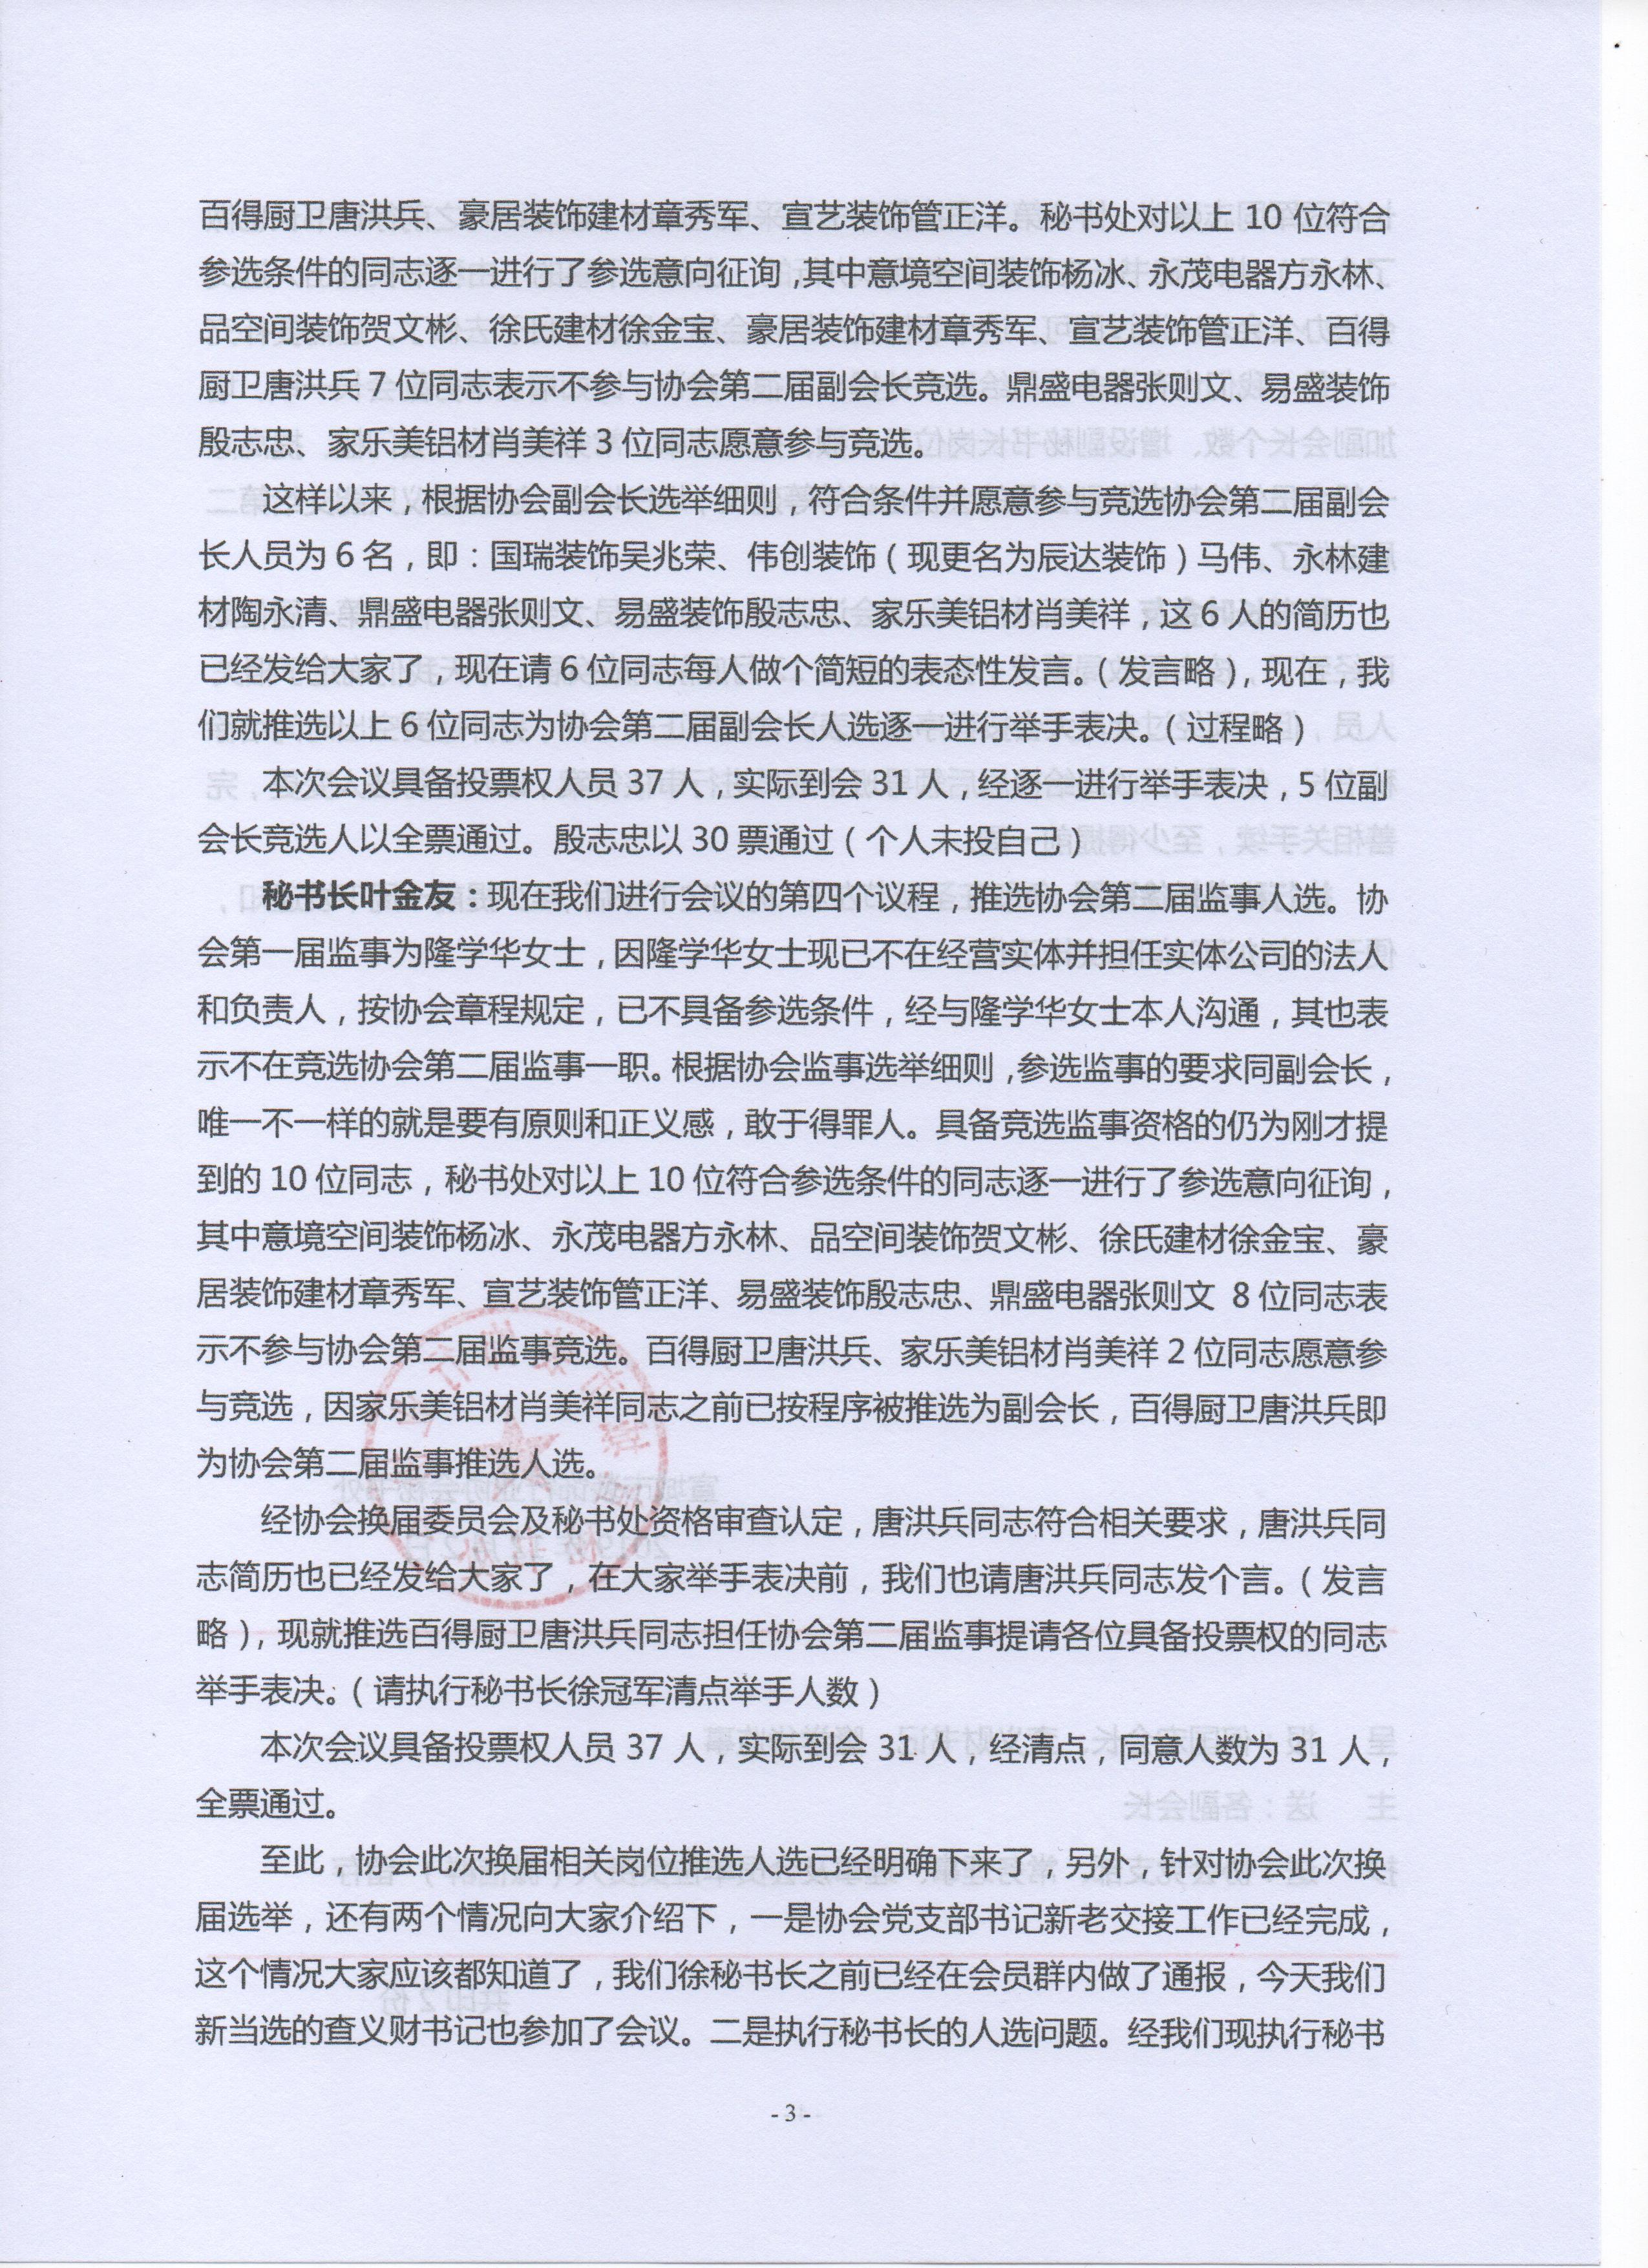 beplay亚洲官网beplay注册行业协会一届十次理事会议会议纪要3